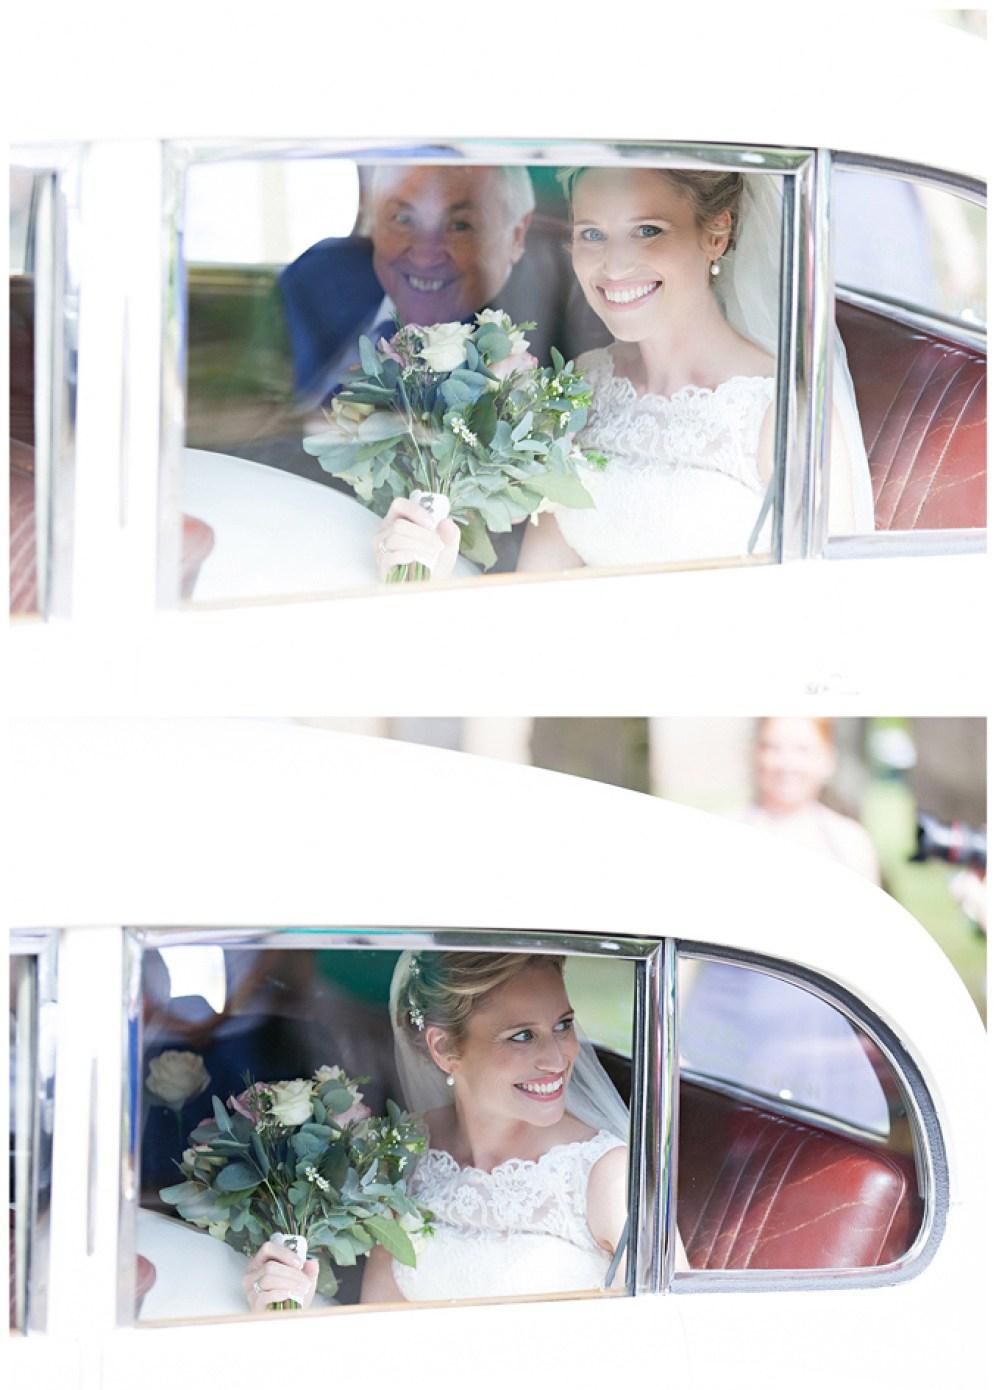 Tania__Tegids_wedding_at_Shustoke_Farm_Barns_in_Warwickshire_by_HBA_Photography_page_4